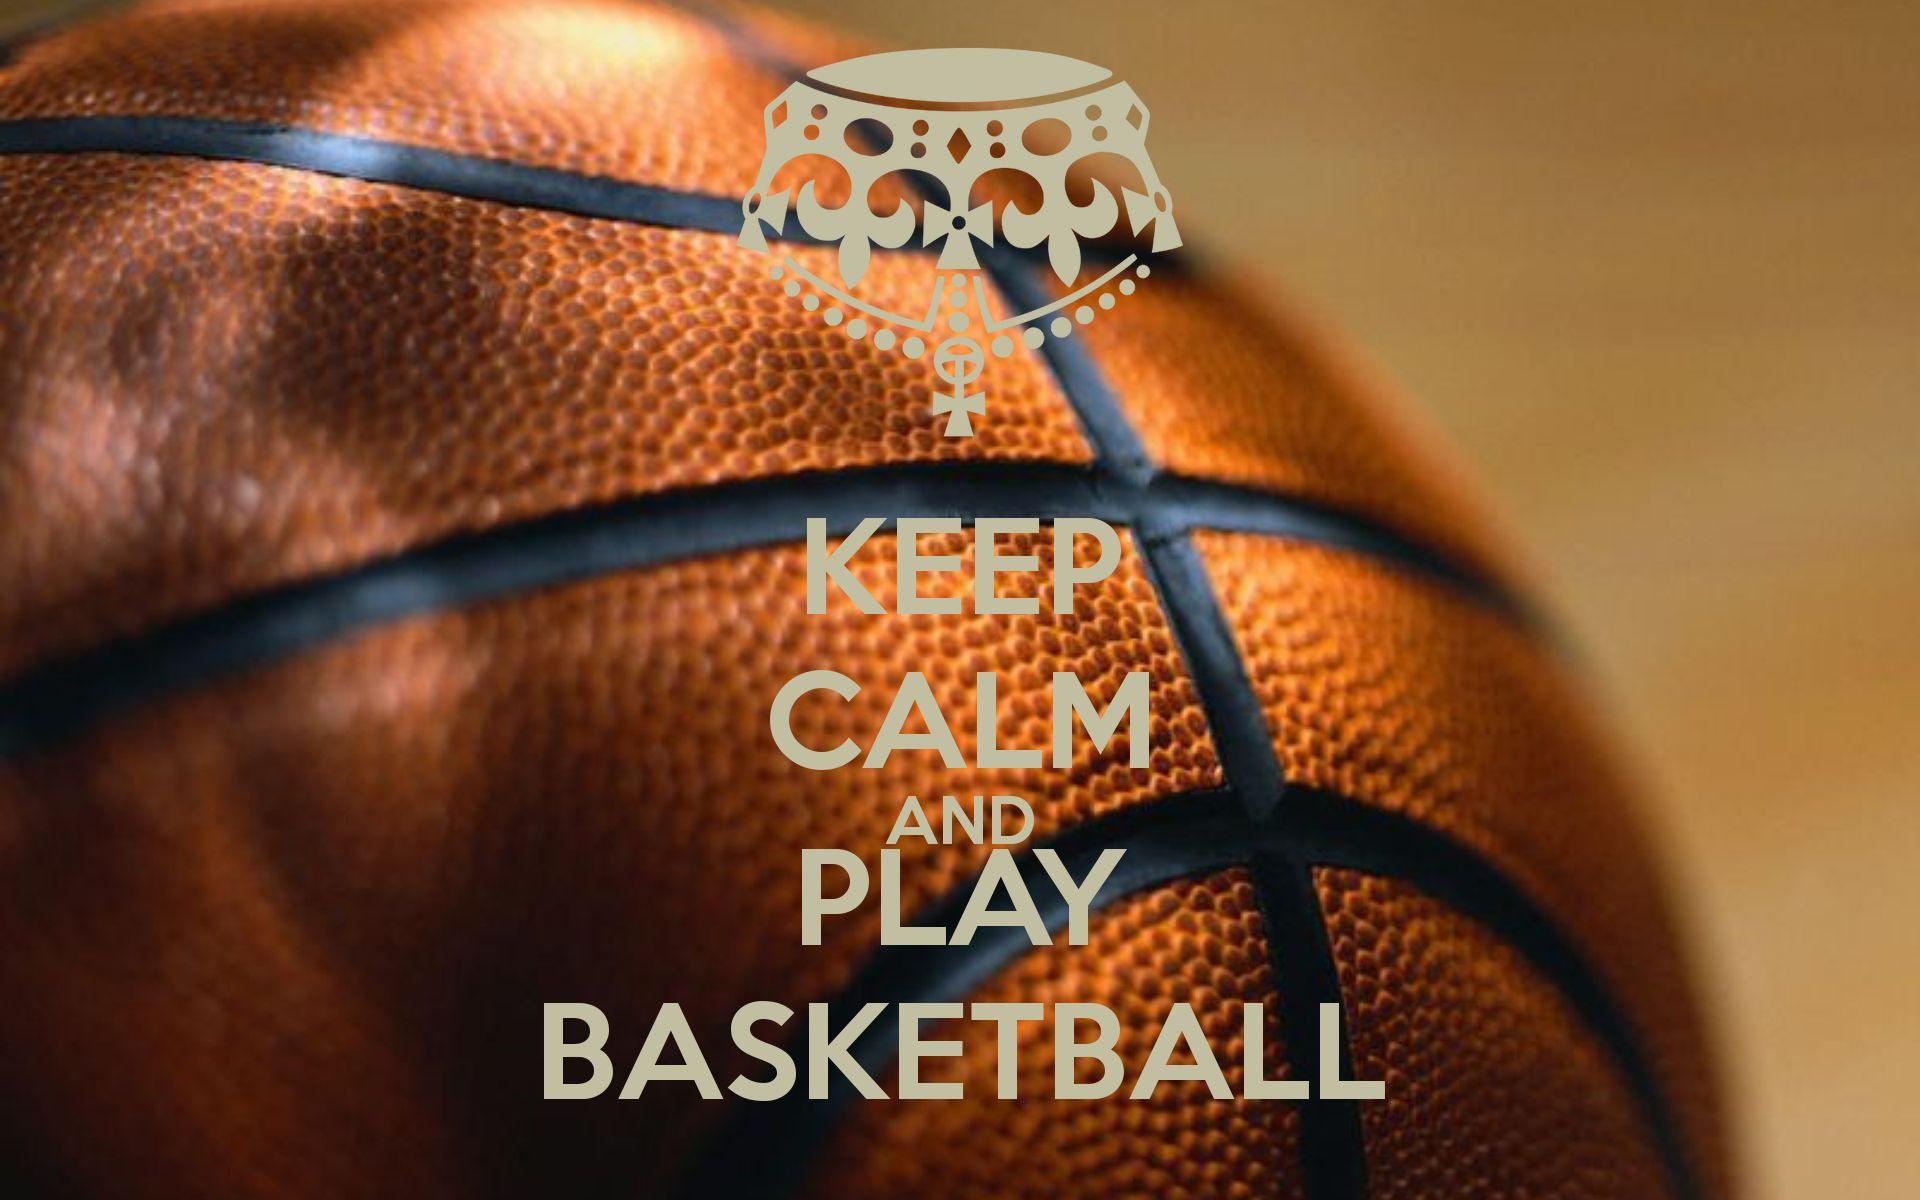 basketball screensavers hd free